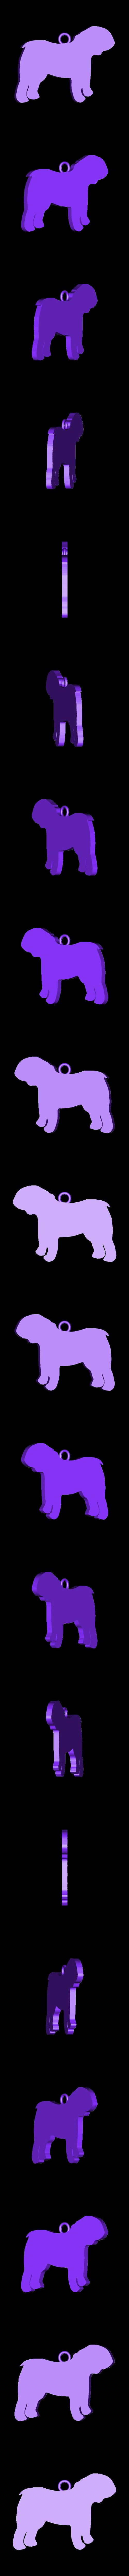 28.stl Download STL file Dogs • 3D printing object, GENNADI3313